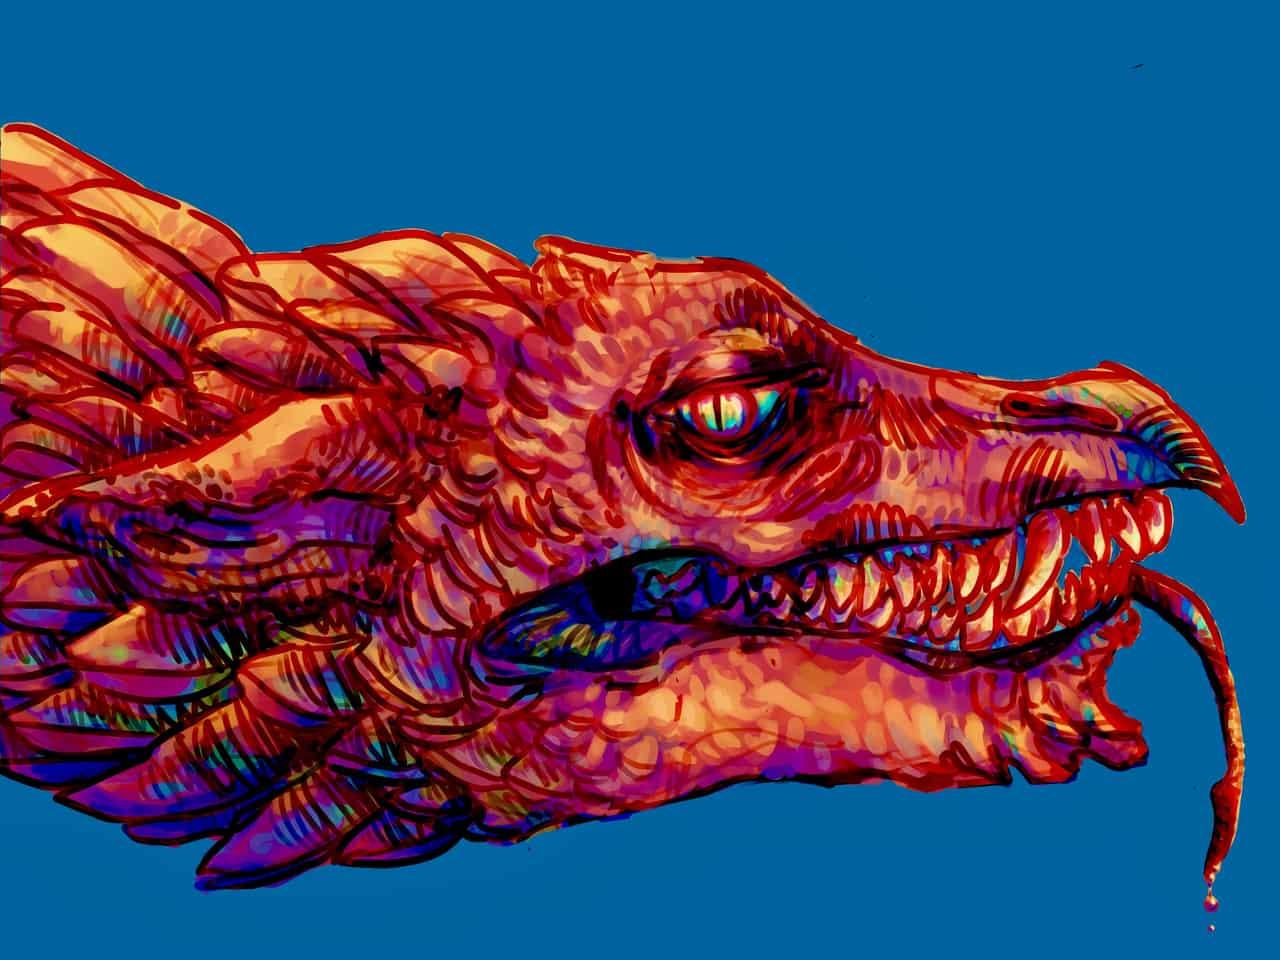 Technicolor Terror Illust of CaputMortuum Monsters dragon Gargoyles color